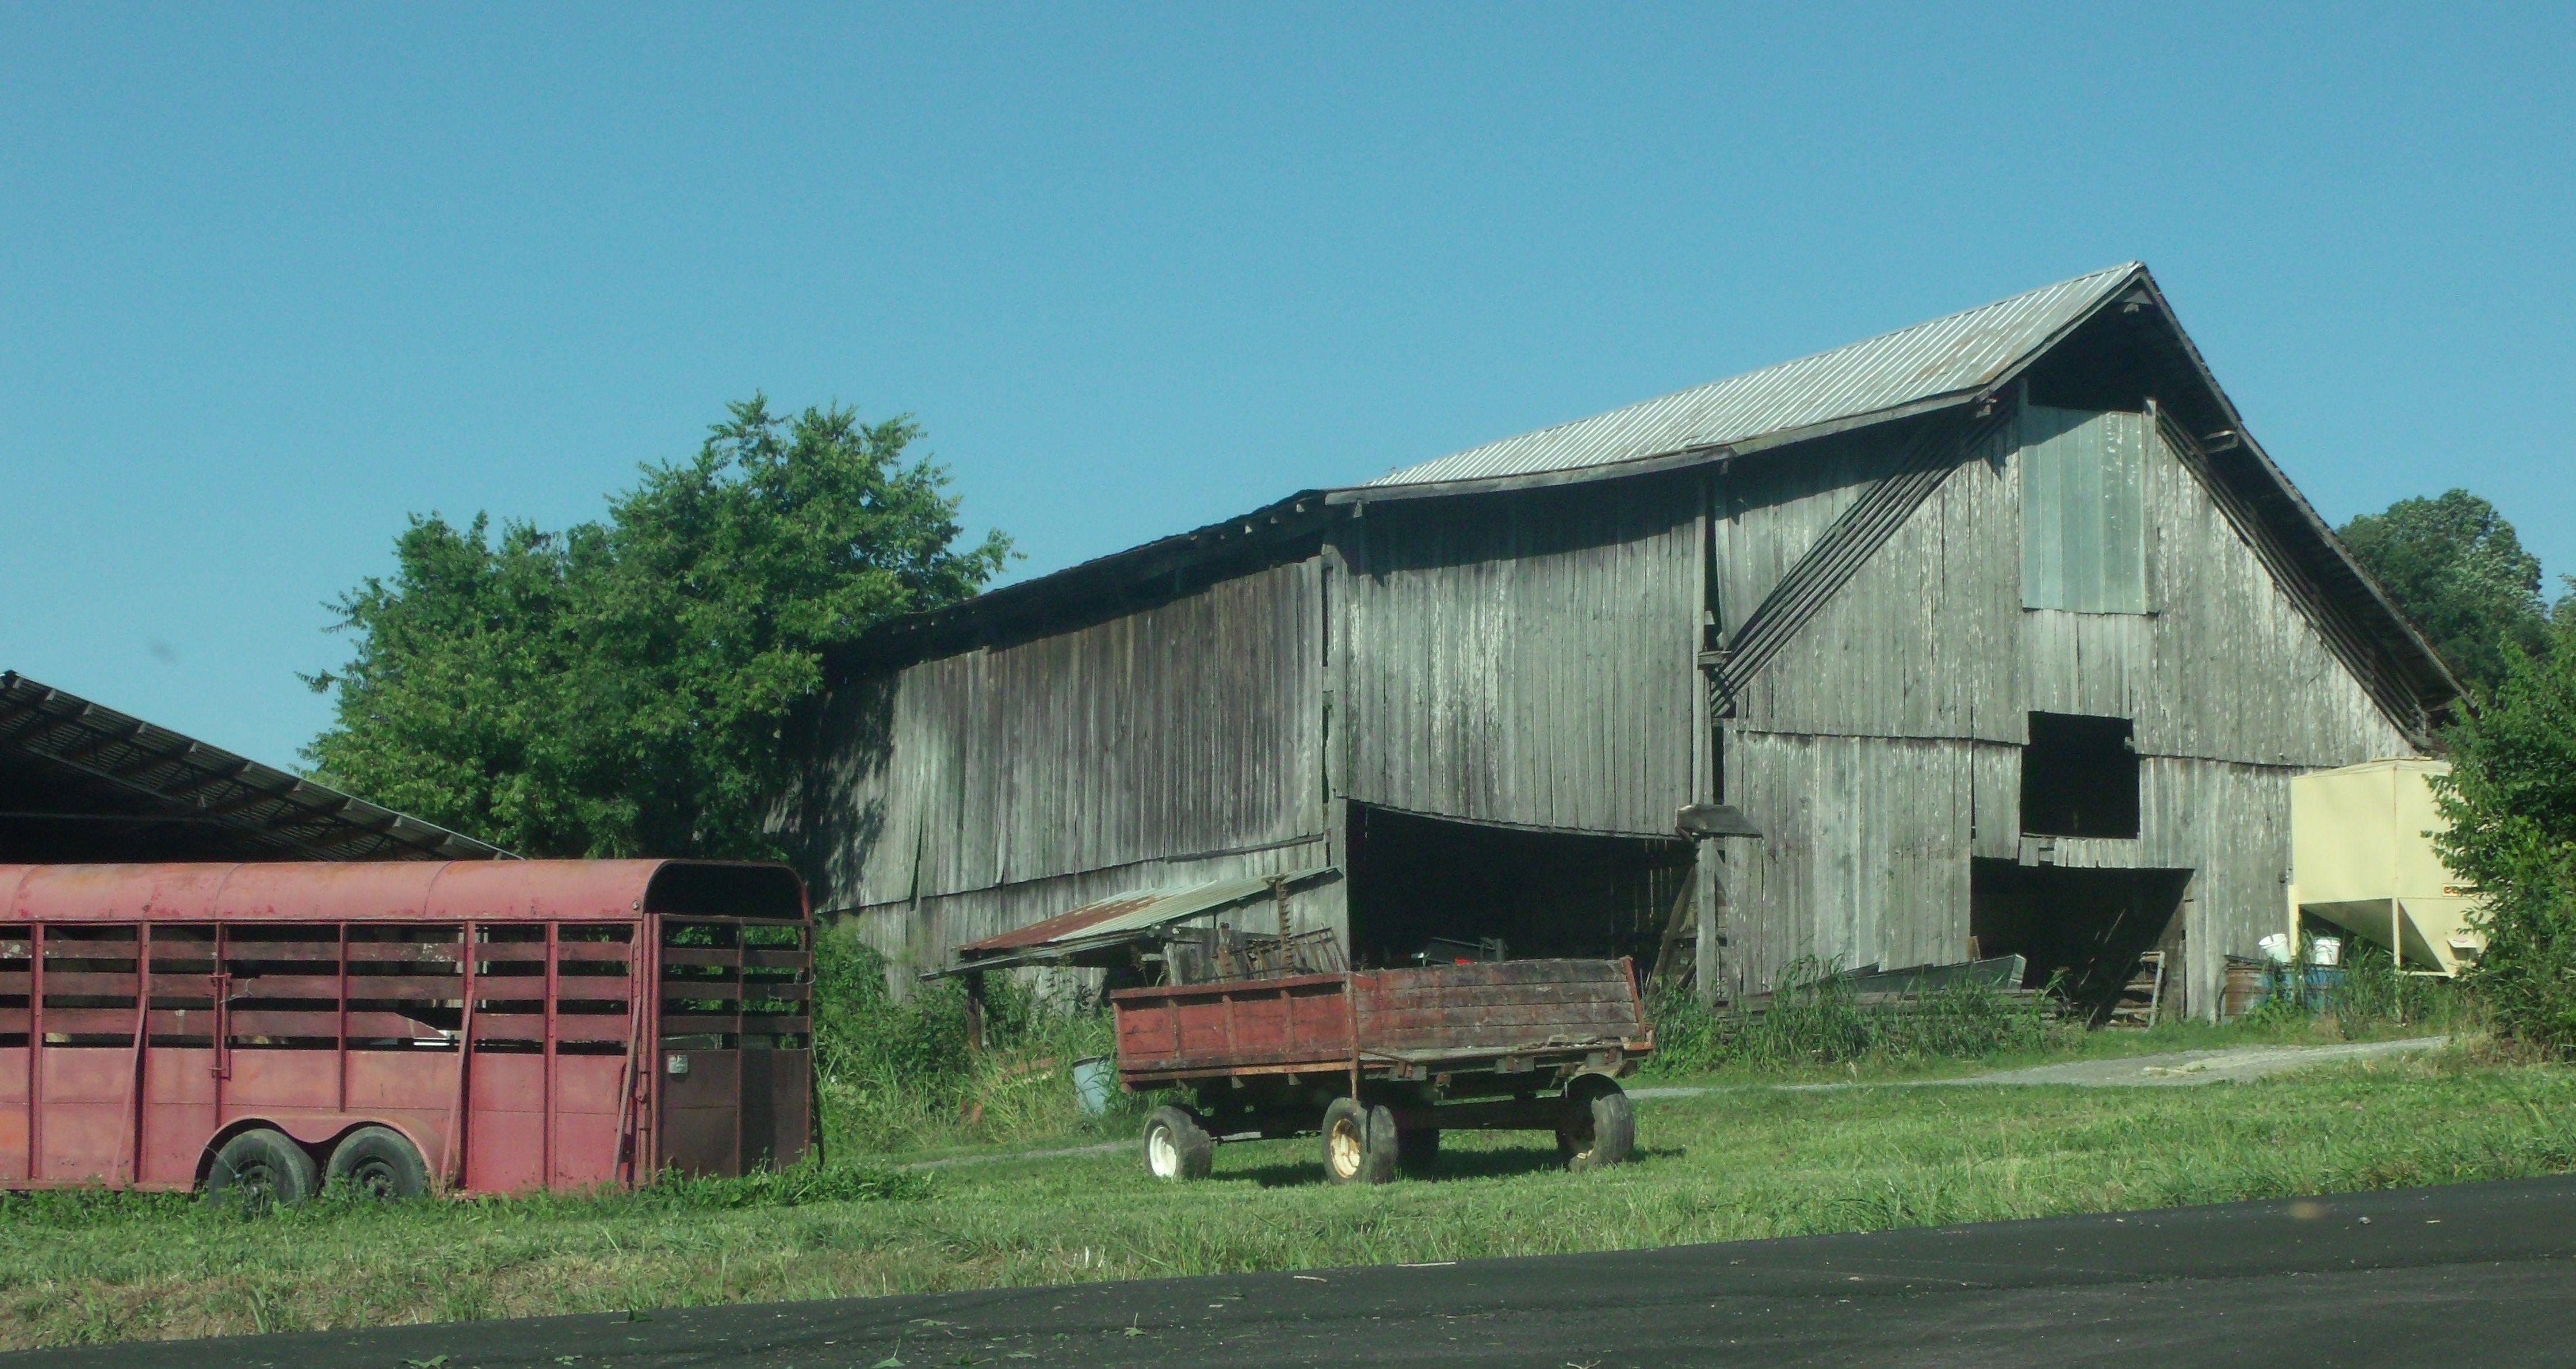 Barn Jearoldstown Greene County Tennessee Greene County Outdoor Tennessee